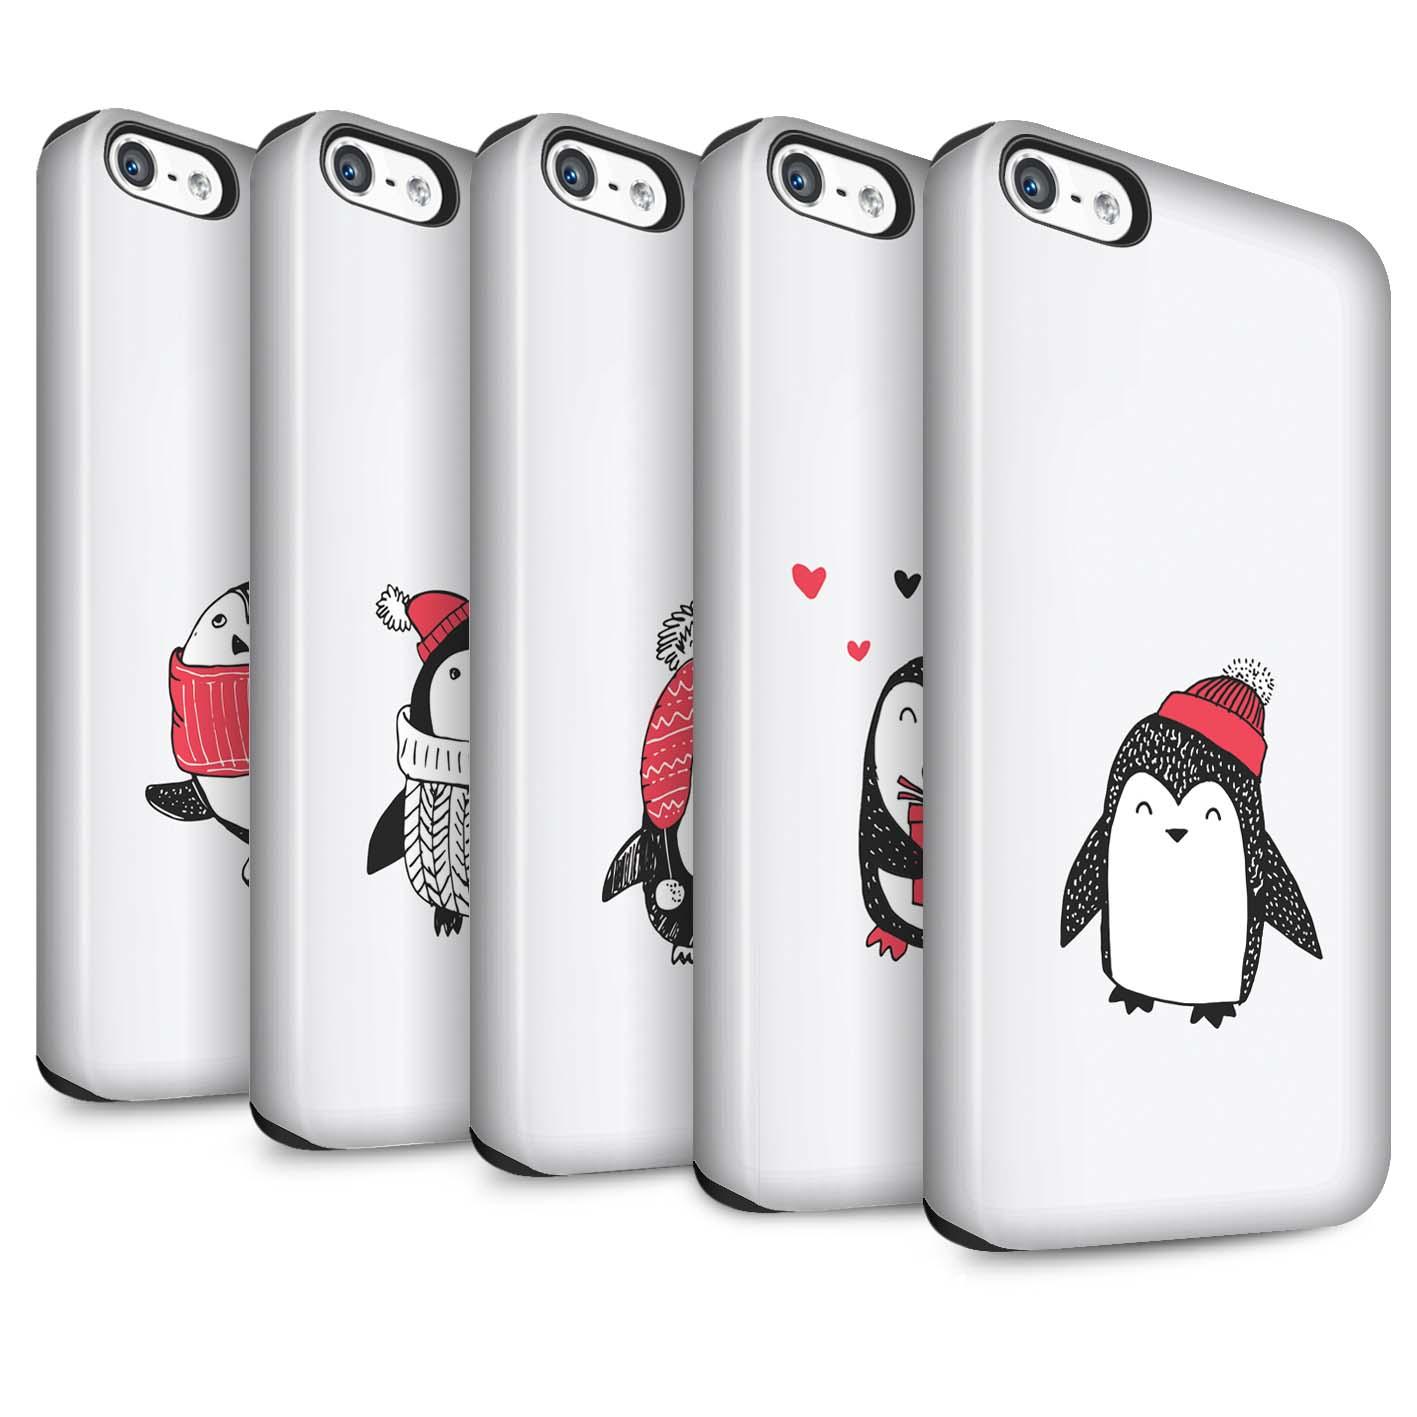 STUFF4 Matte Tough Phone Case for Apple iPhone SE /Cute Dood